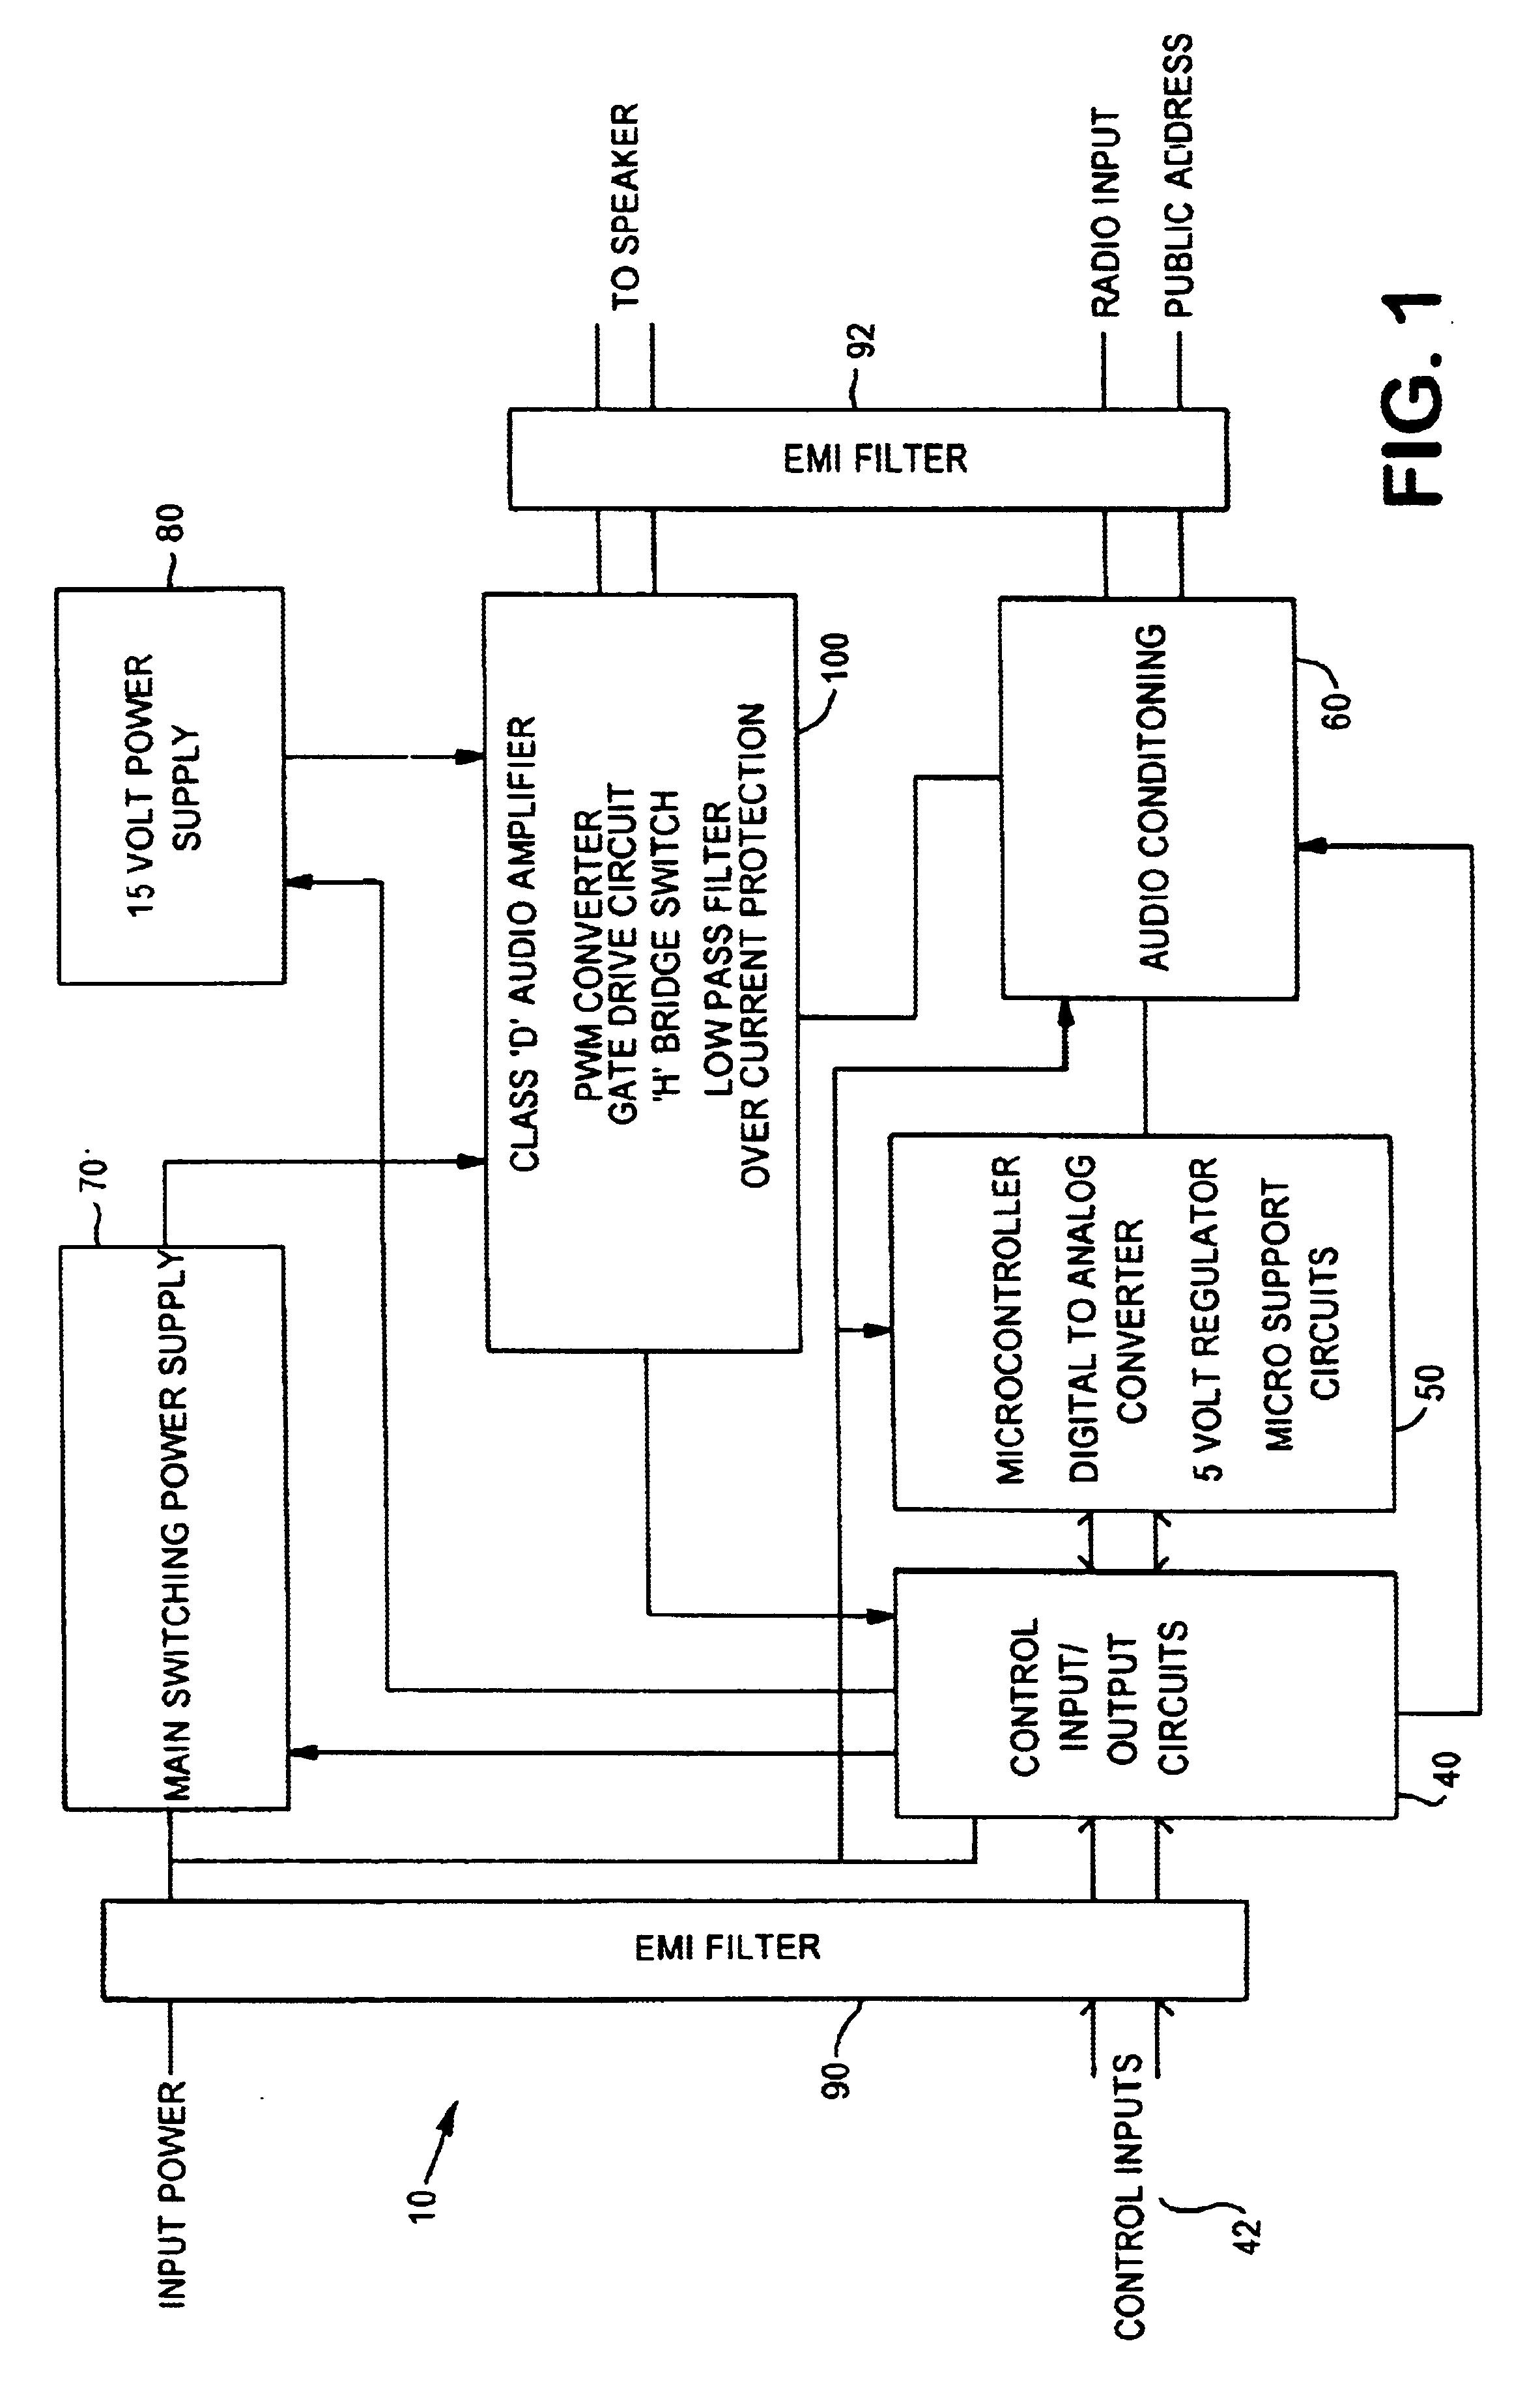 Wiring Diagram Additionally Whelen Light Wiring Diagram On Whelen